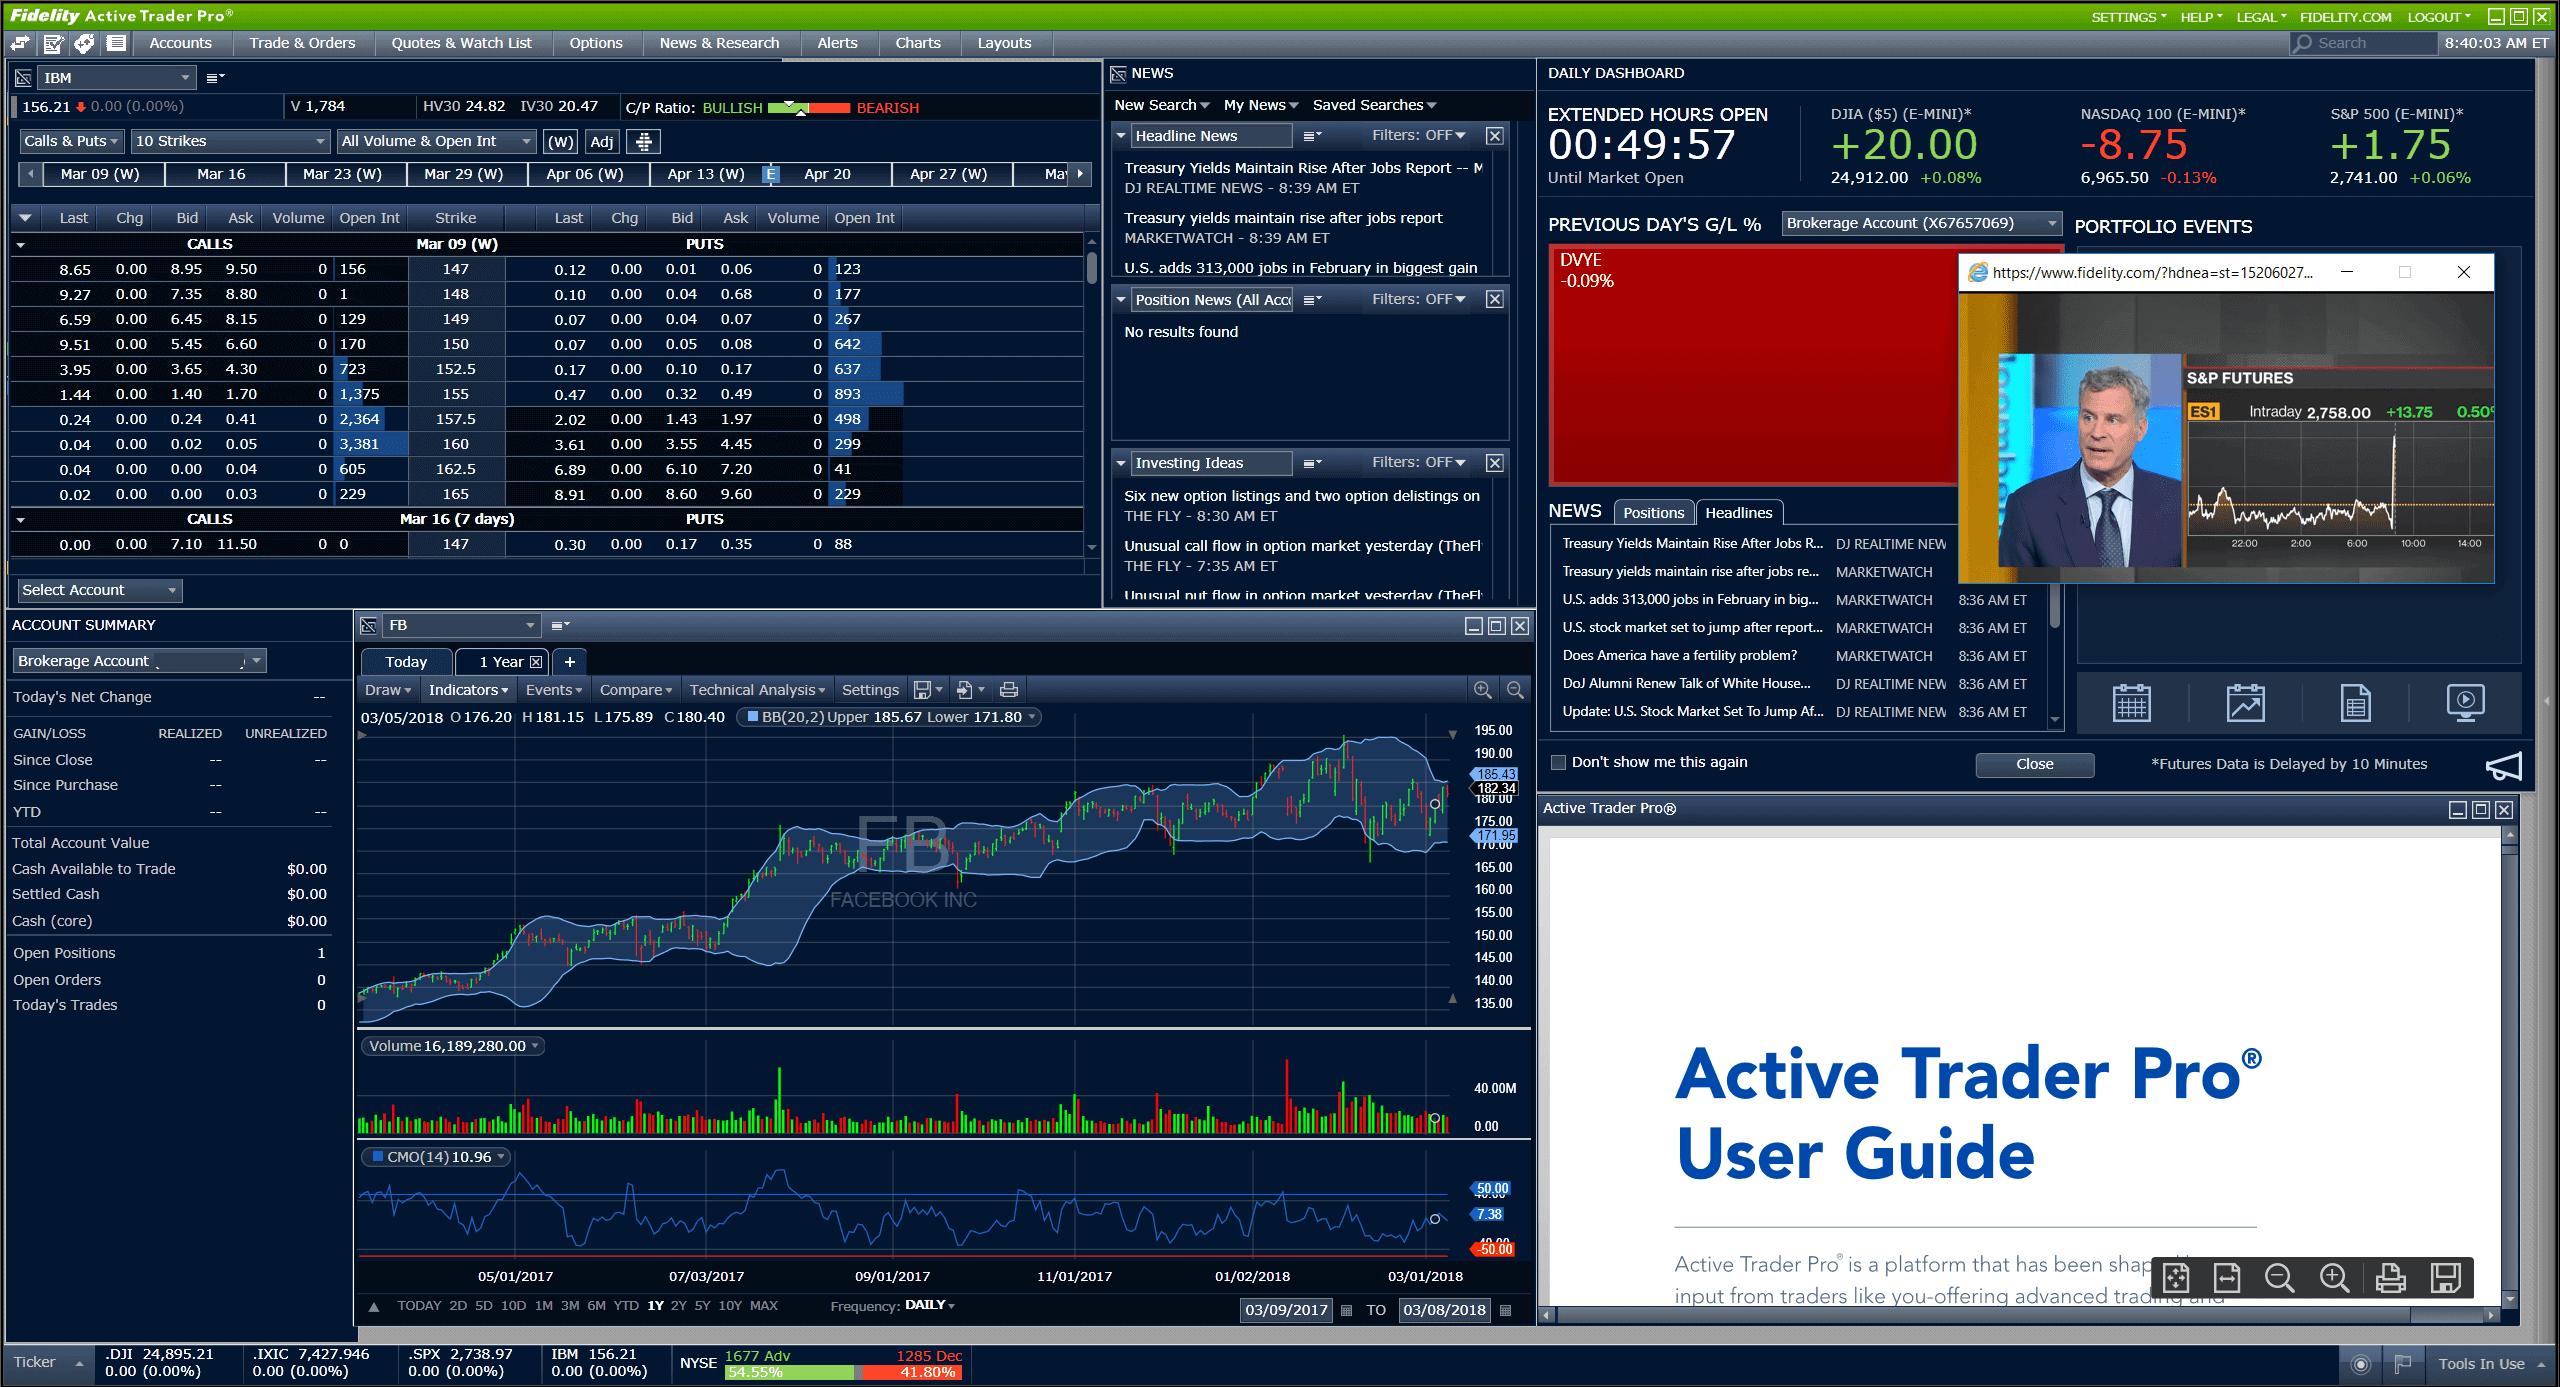 Fidelity Active Trader Pro